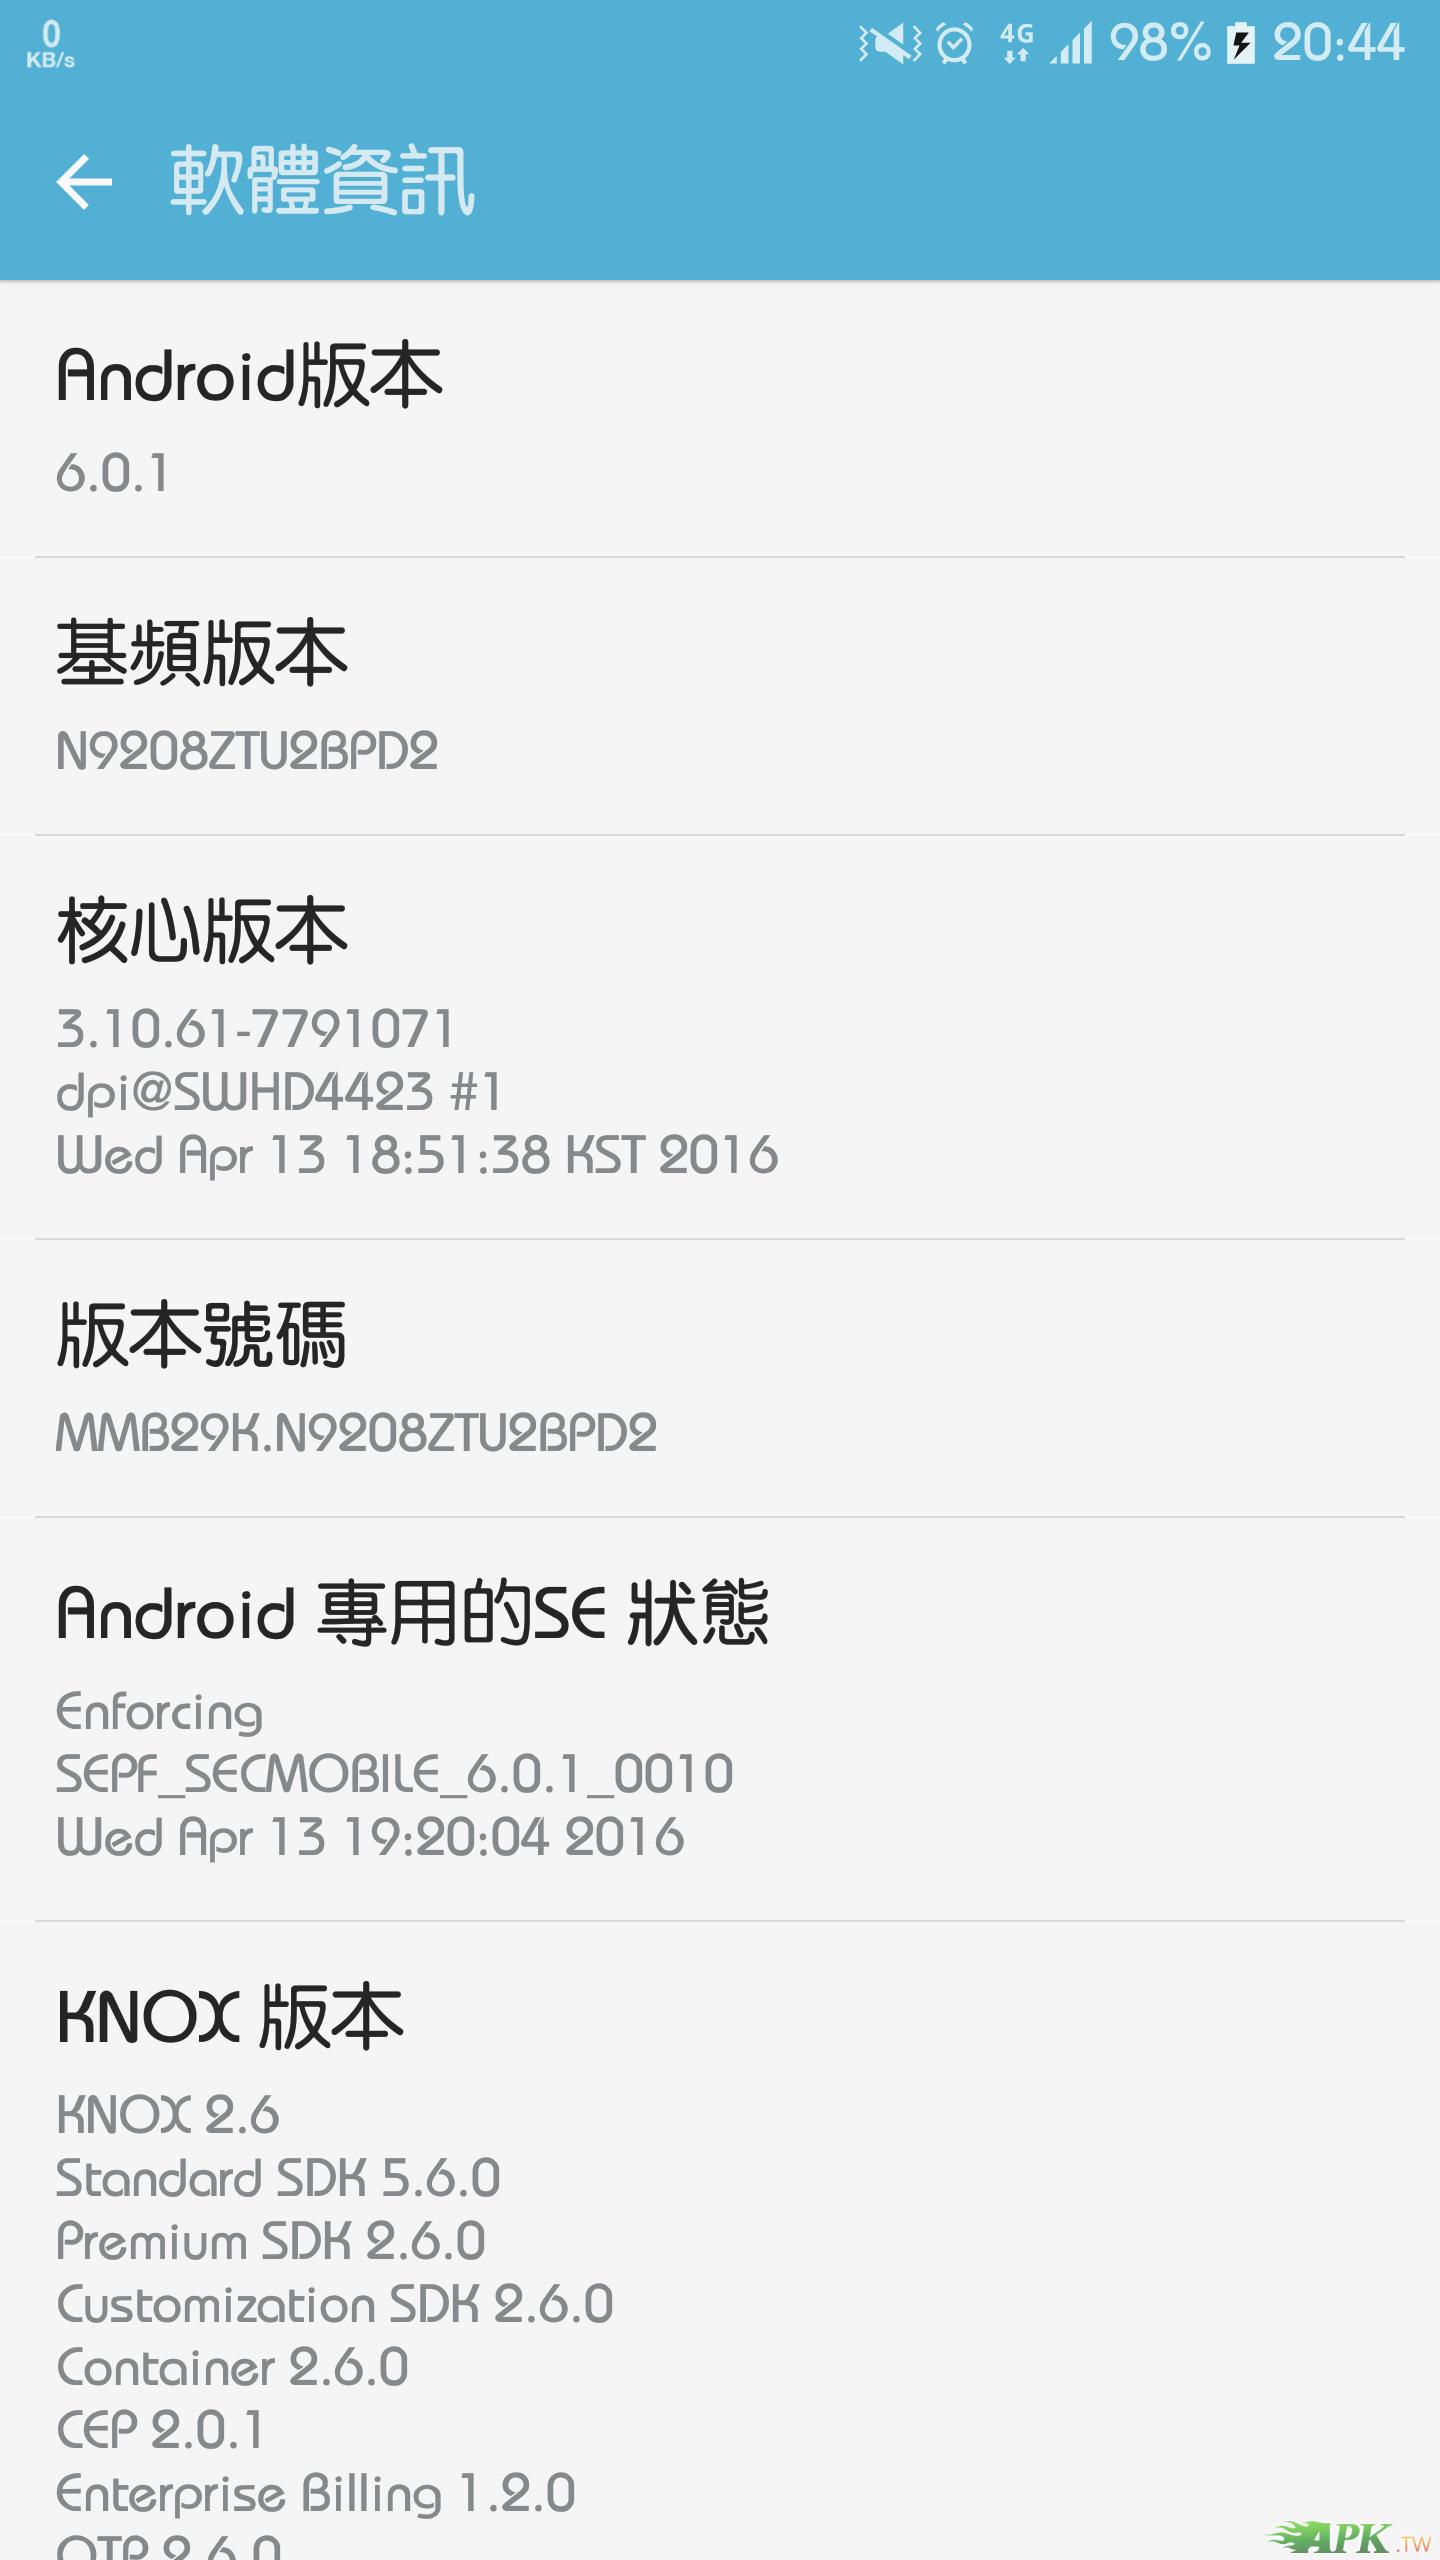 Screenshot_20160424-204427.png